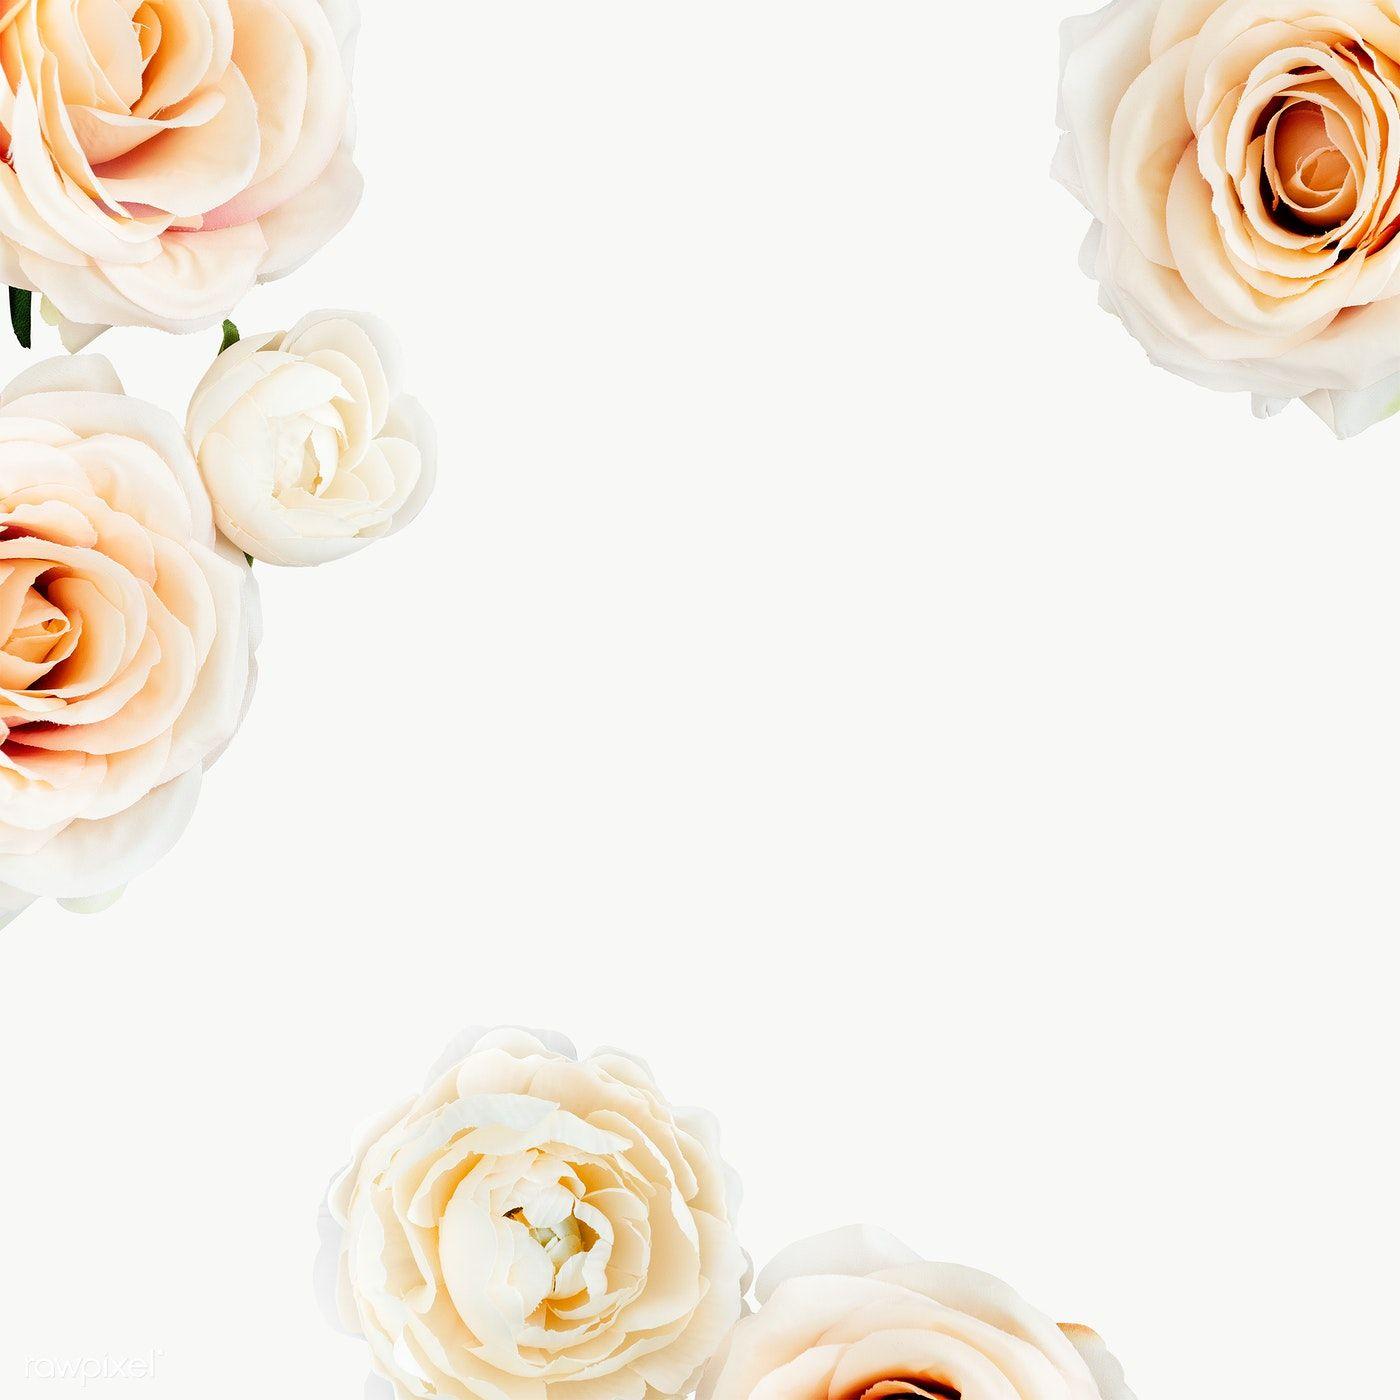 White Rose Frame Transparent Png Premium Image By Rawpixel Com Nam White Roses White Anemone Flower Green Leaf Decor